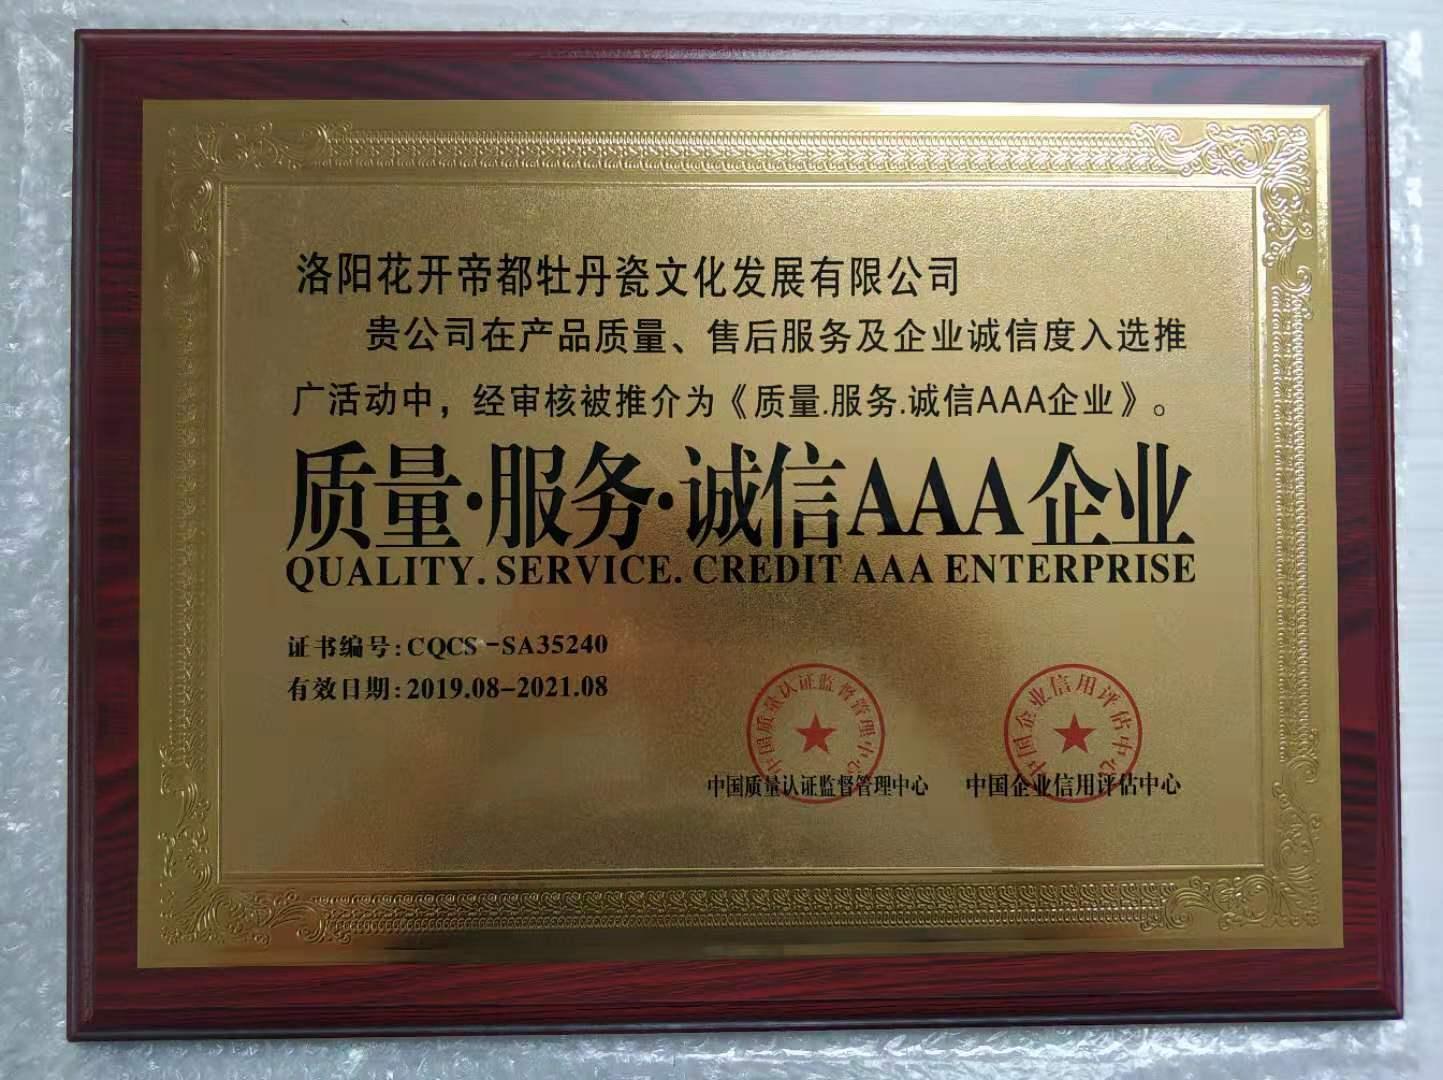 牡丹瓷AAA企业